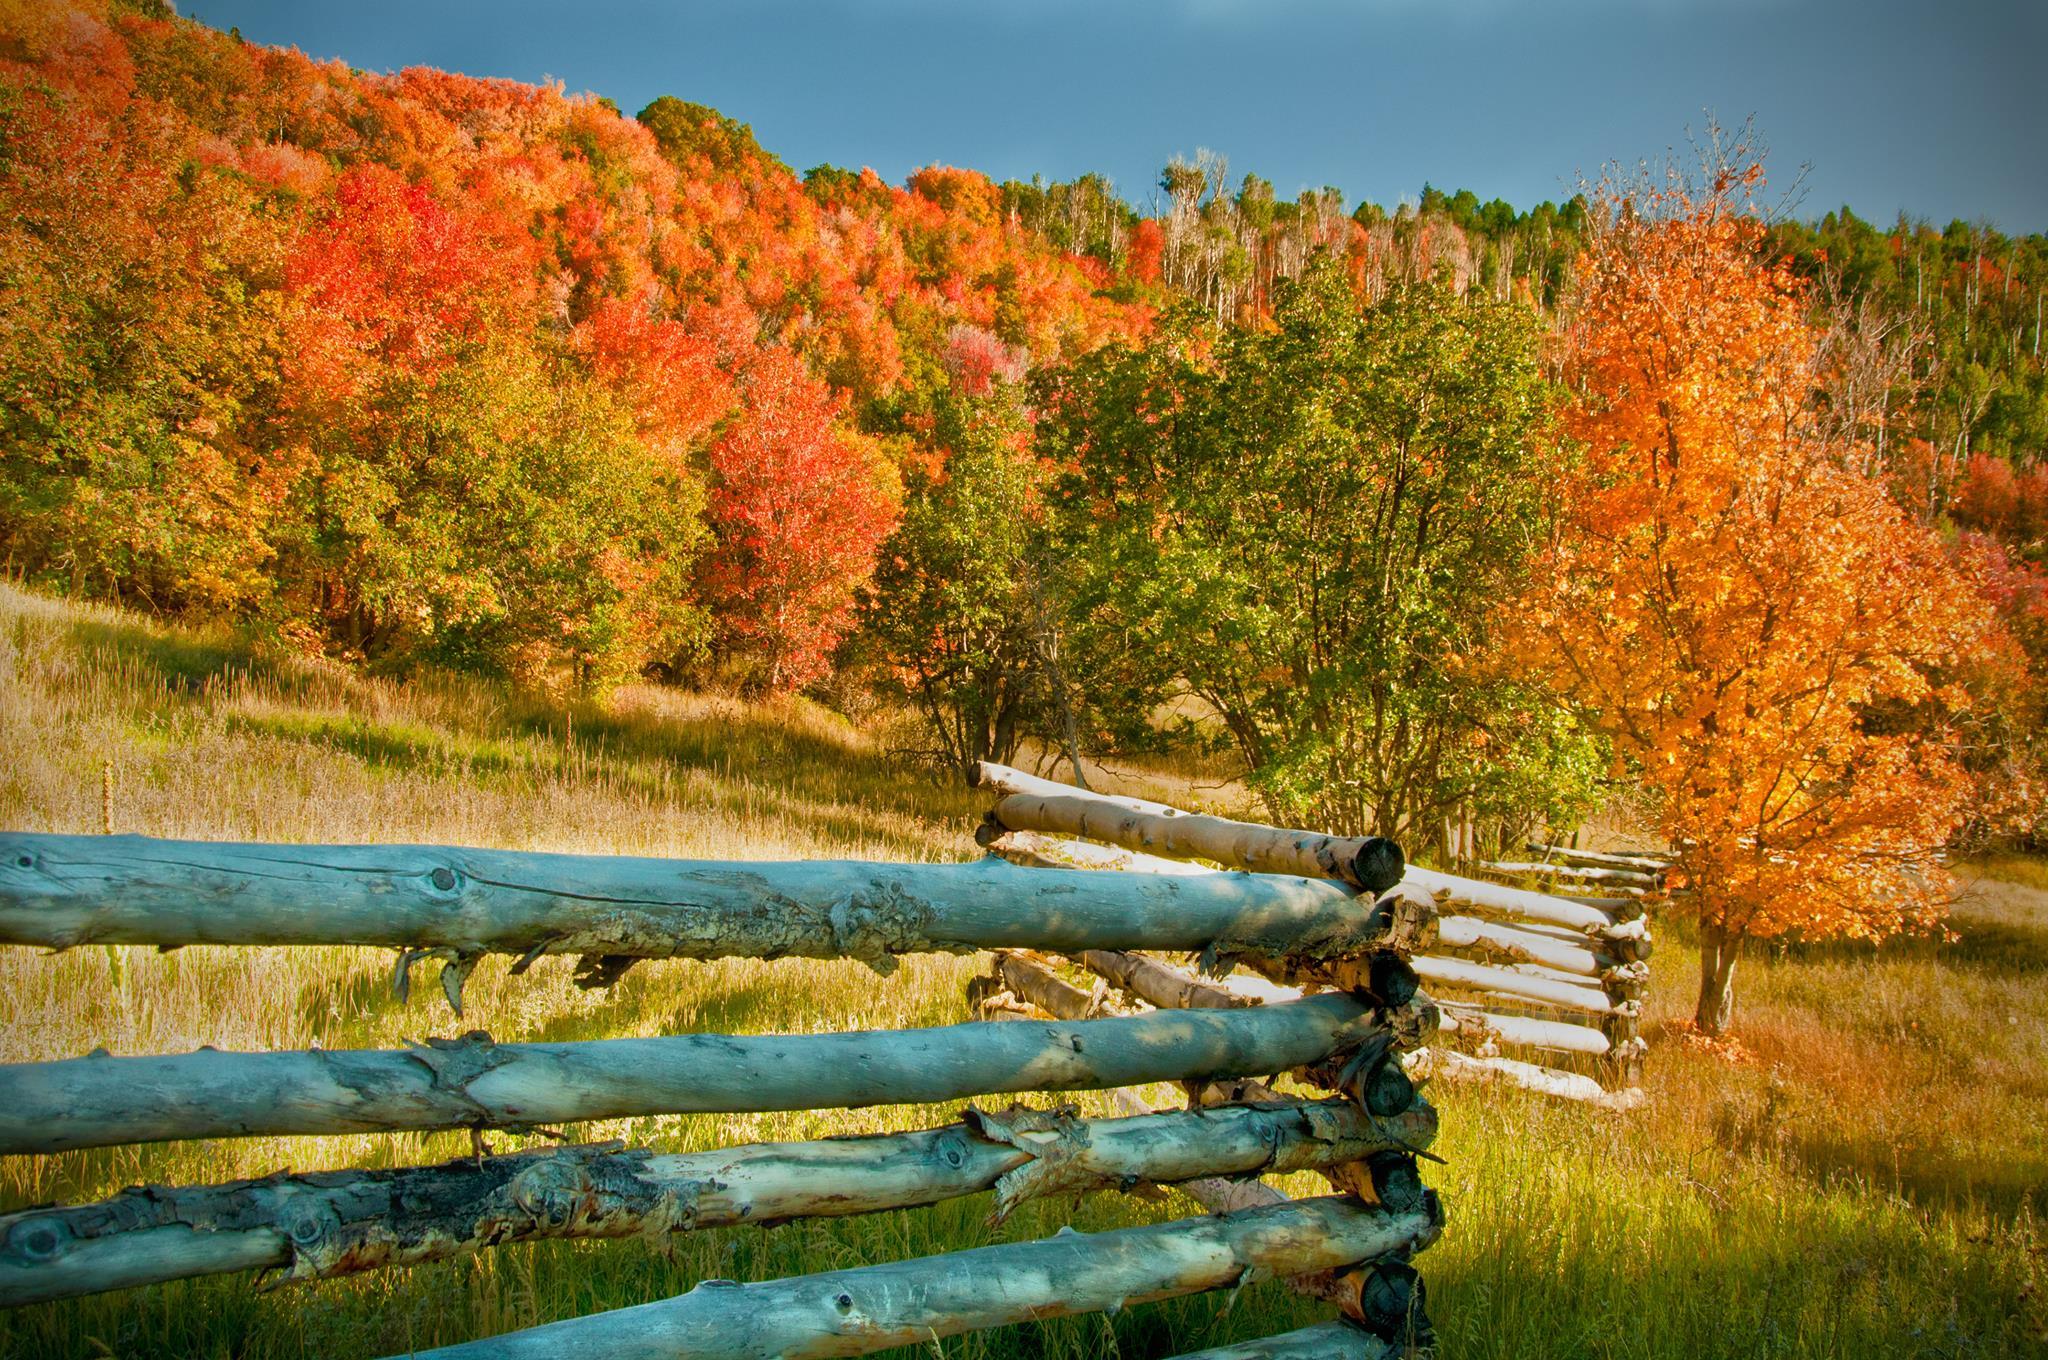 Vibrant hues up Cedar Canyon, Utah, date unspecified| photo courtesy of Sam El Halta, St. George News